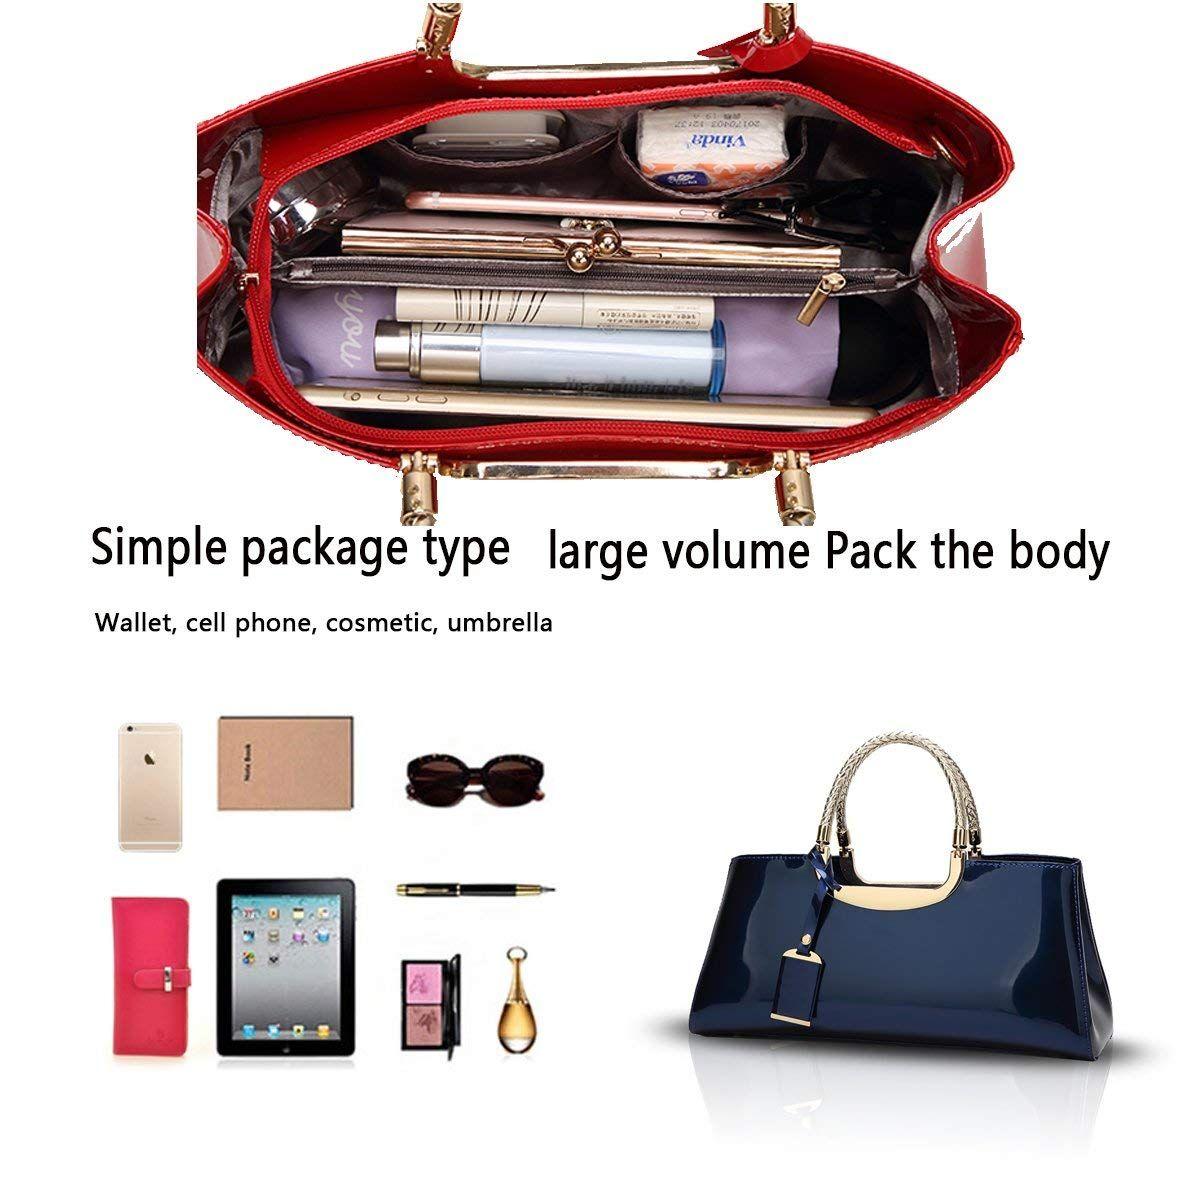 13039d0f78aa Tisdaini 2018 Ladies Handbag Fashion Patent Leather Glossy Casual Shoulder  Messenger Bag Wallet Ladies Atmosphere Wild